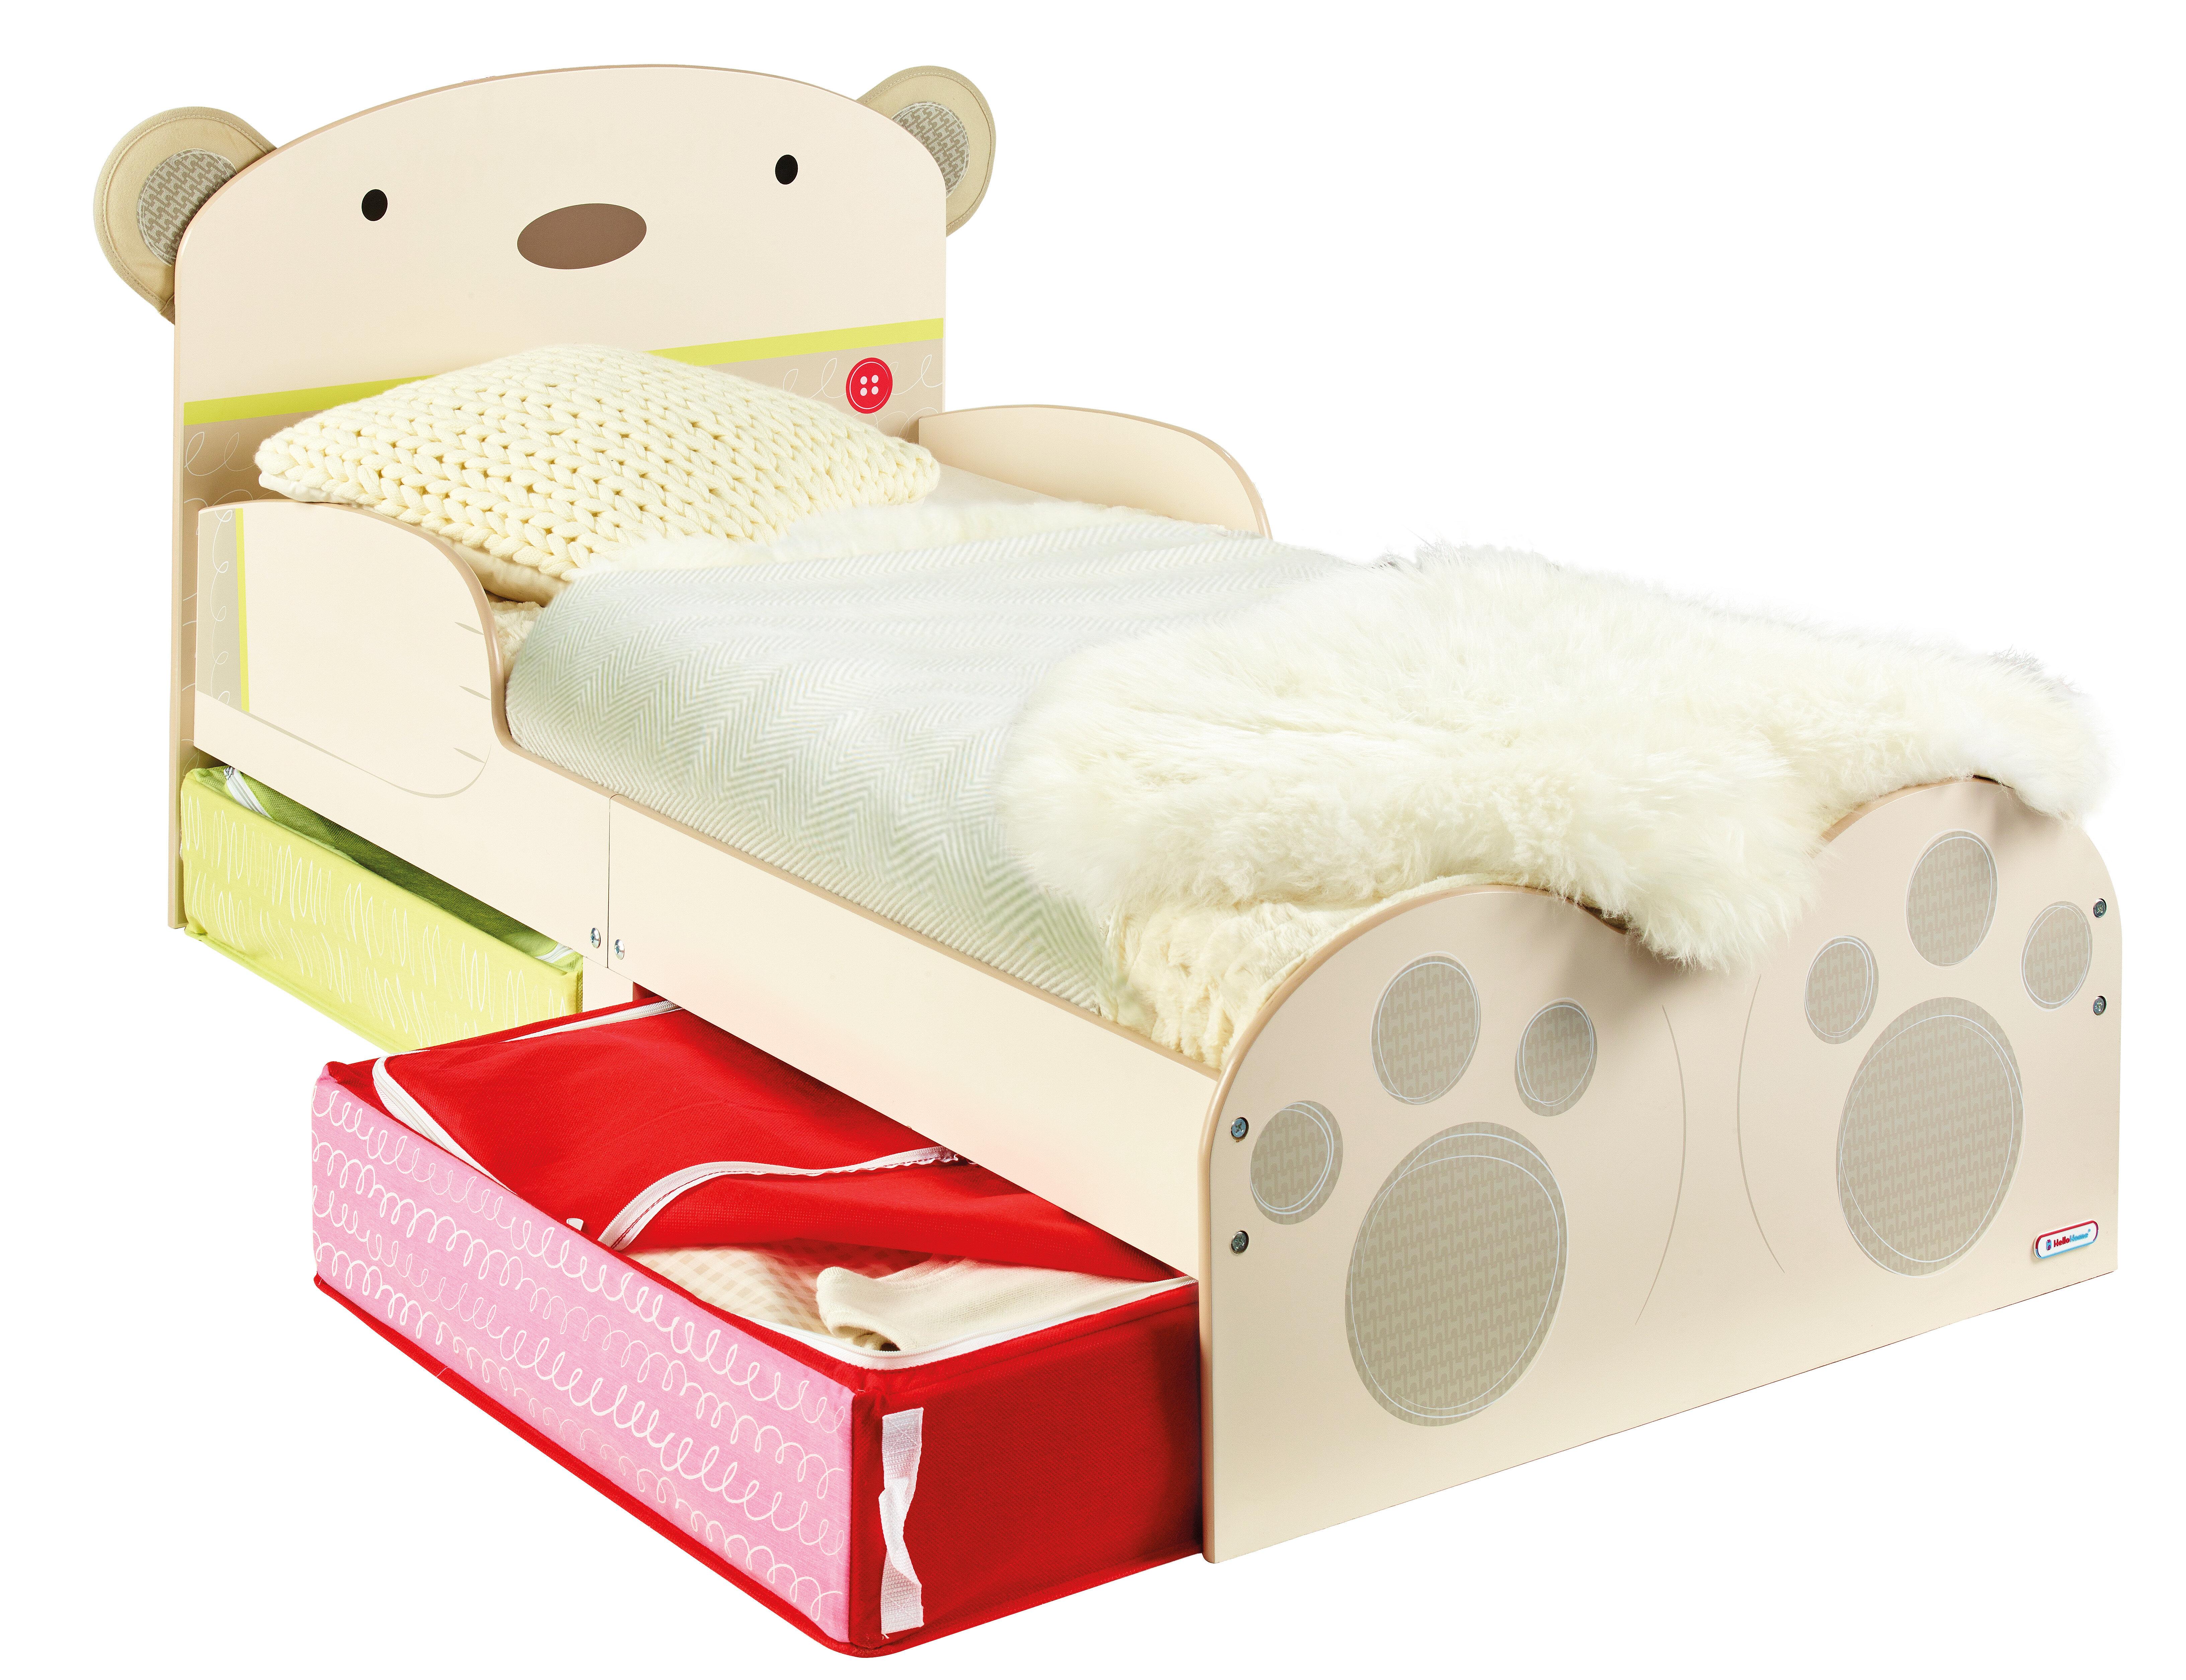 sc 1 st  Wayfair & Hello Home BearHug Toddler Bed with Underbed Storage | Wayfair.co.uk